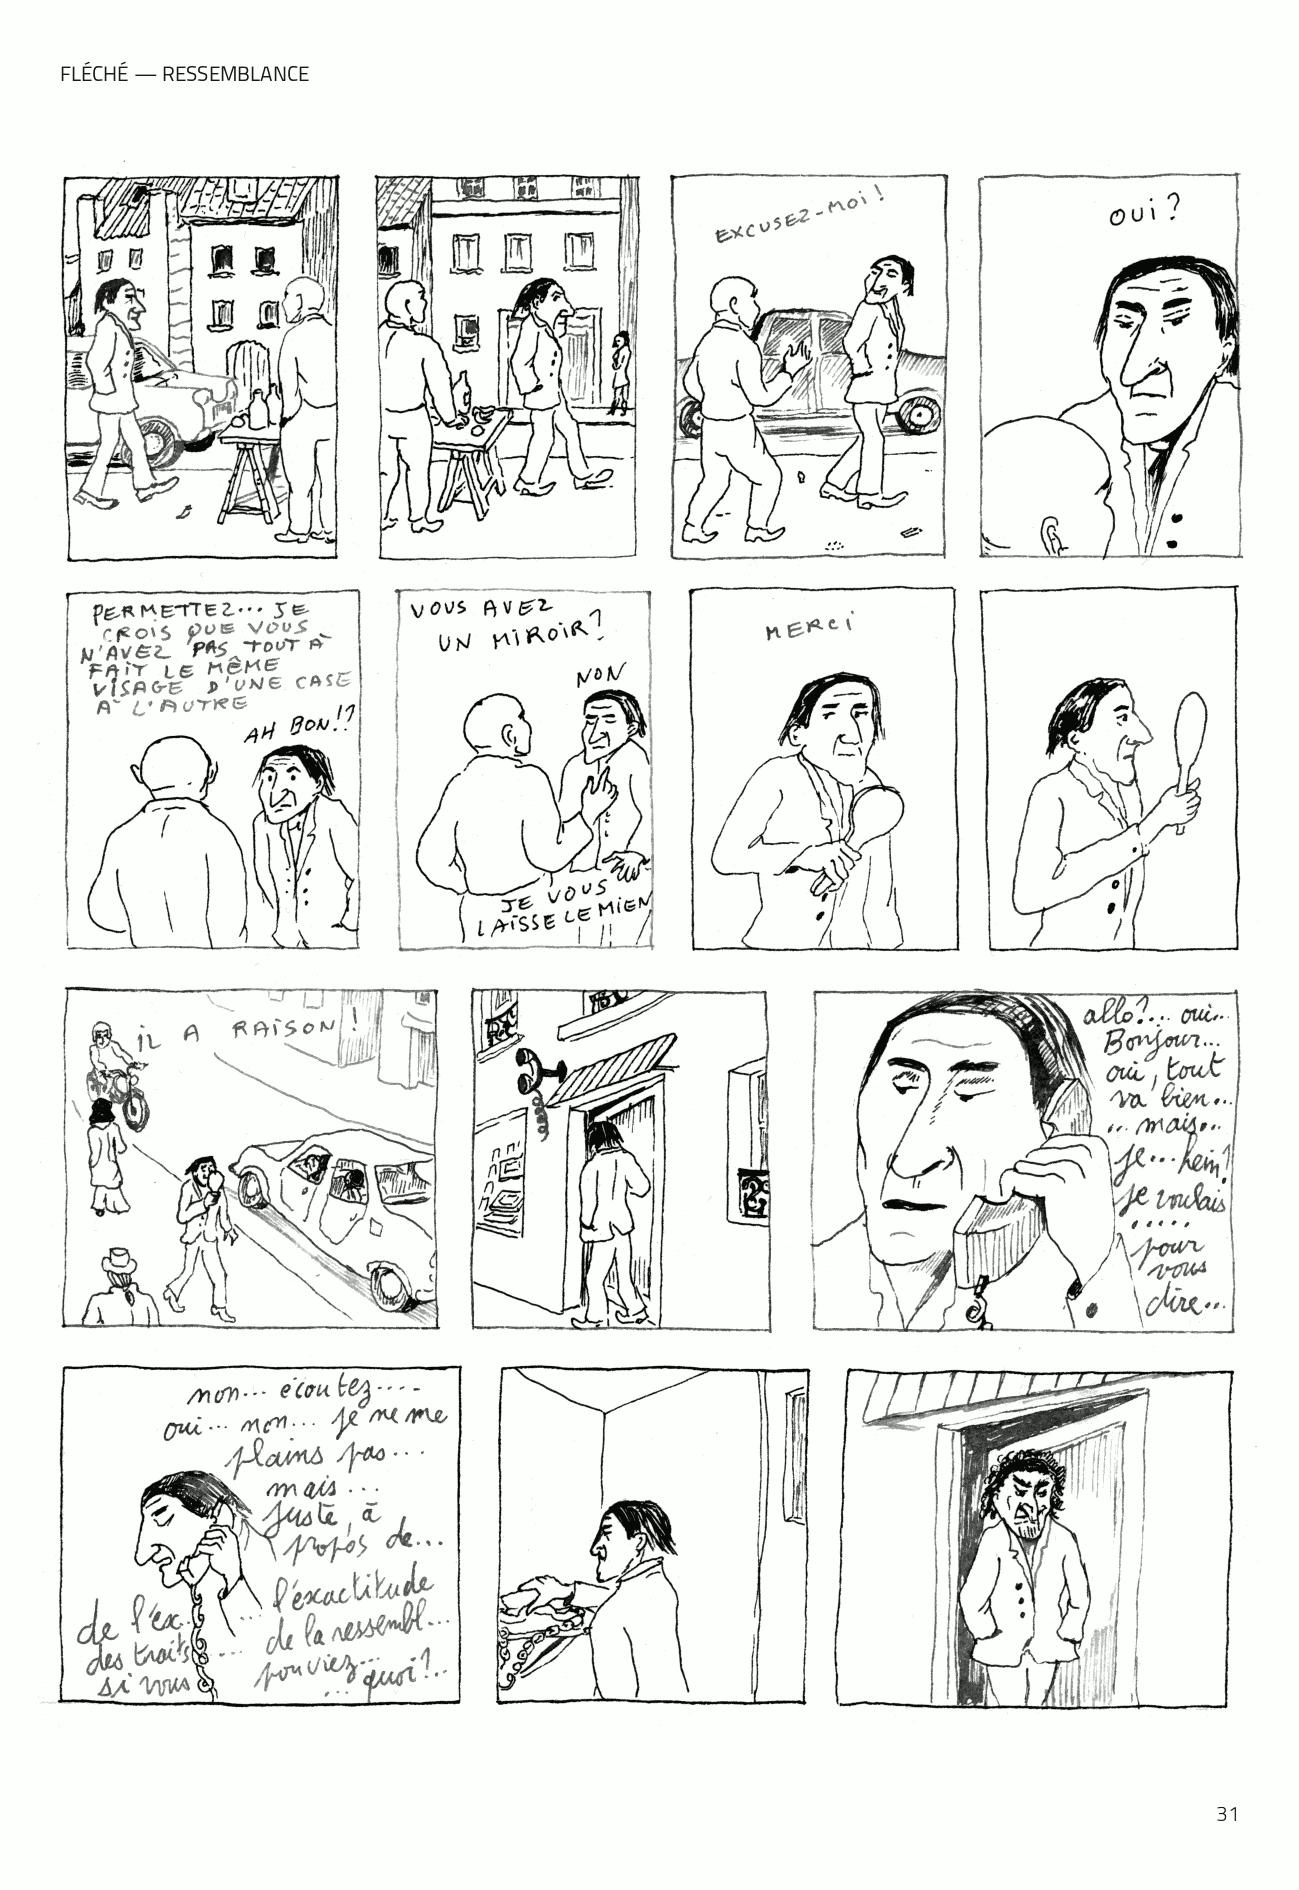 Masse – La collèque